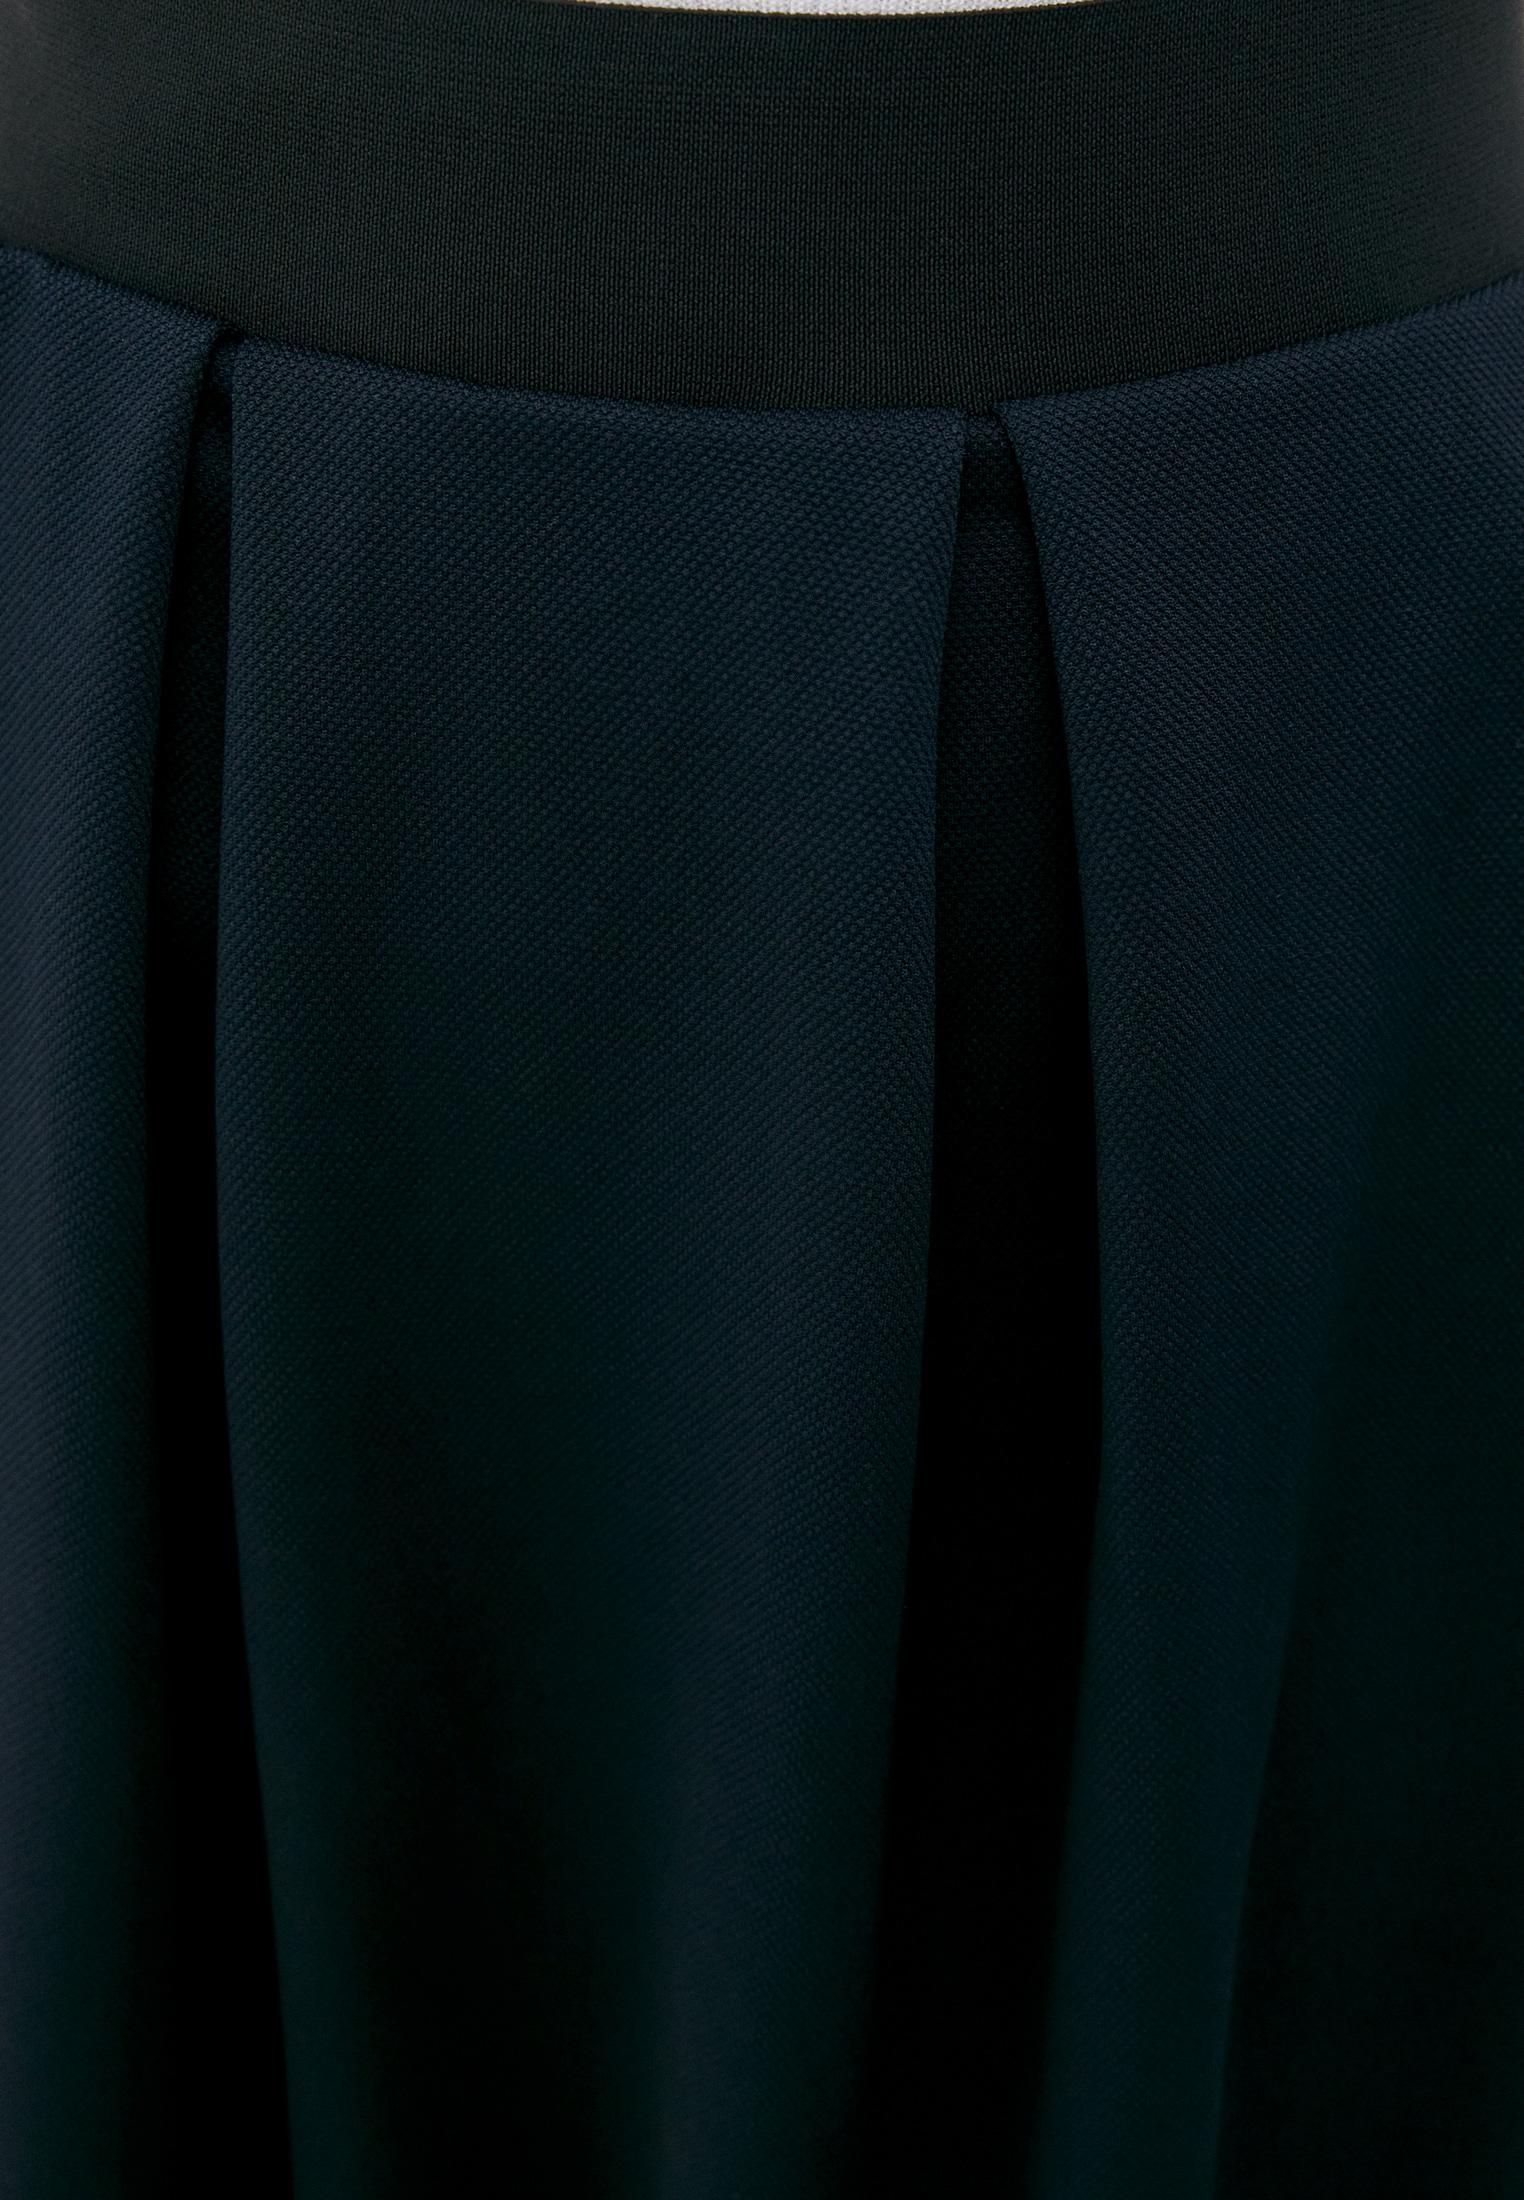 Широкая юбка Toku Tino TT8518024/: изображение 4